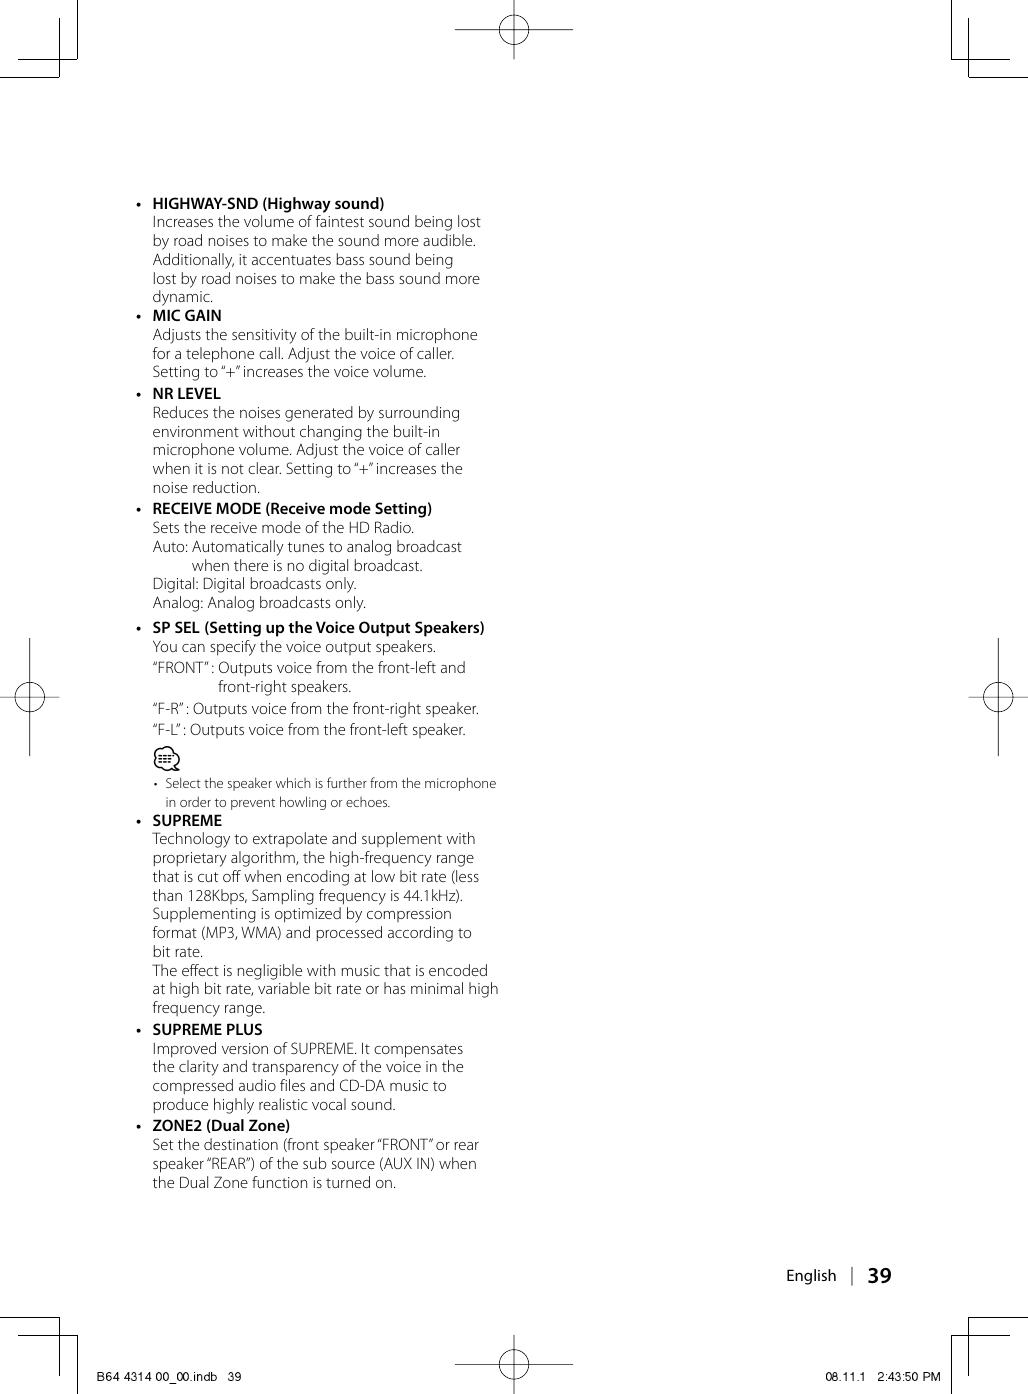 Kenwood Excelon Kdc X493 Users Manual B64 4314 00_00